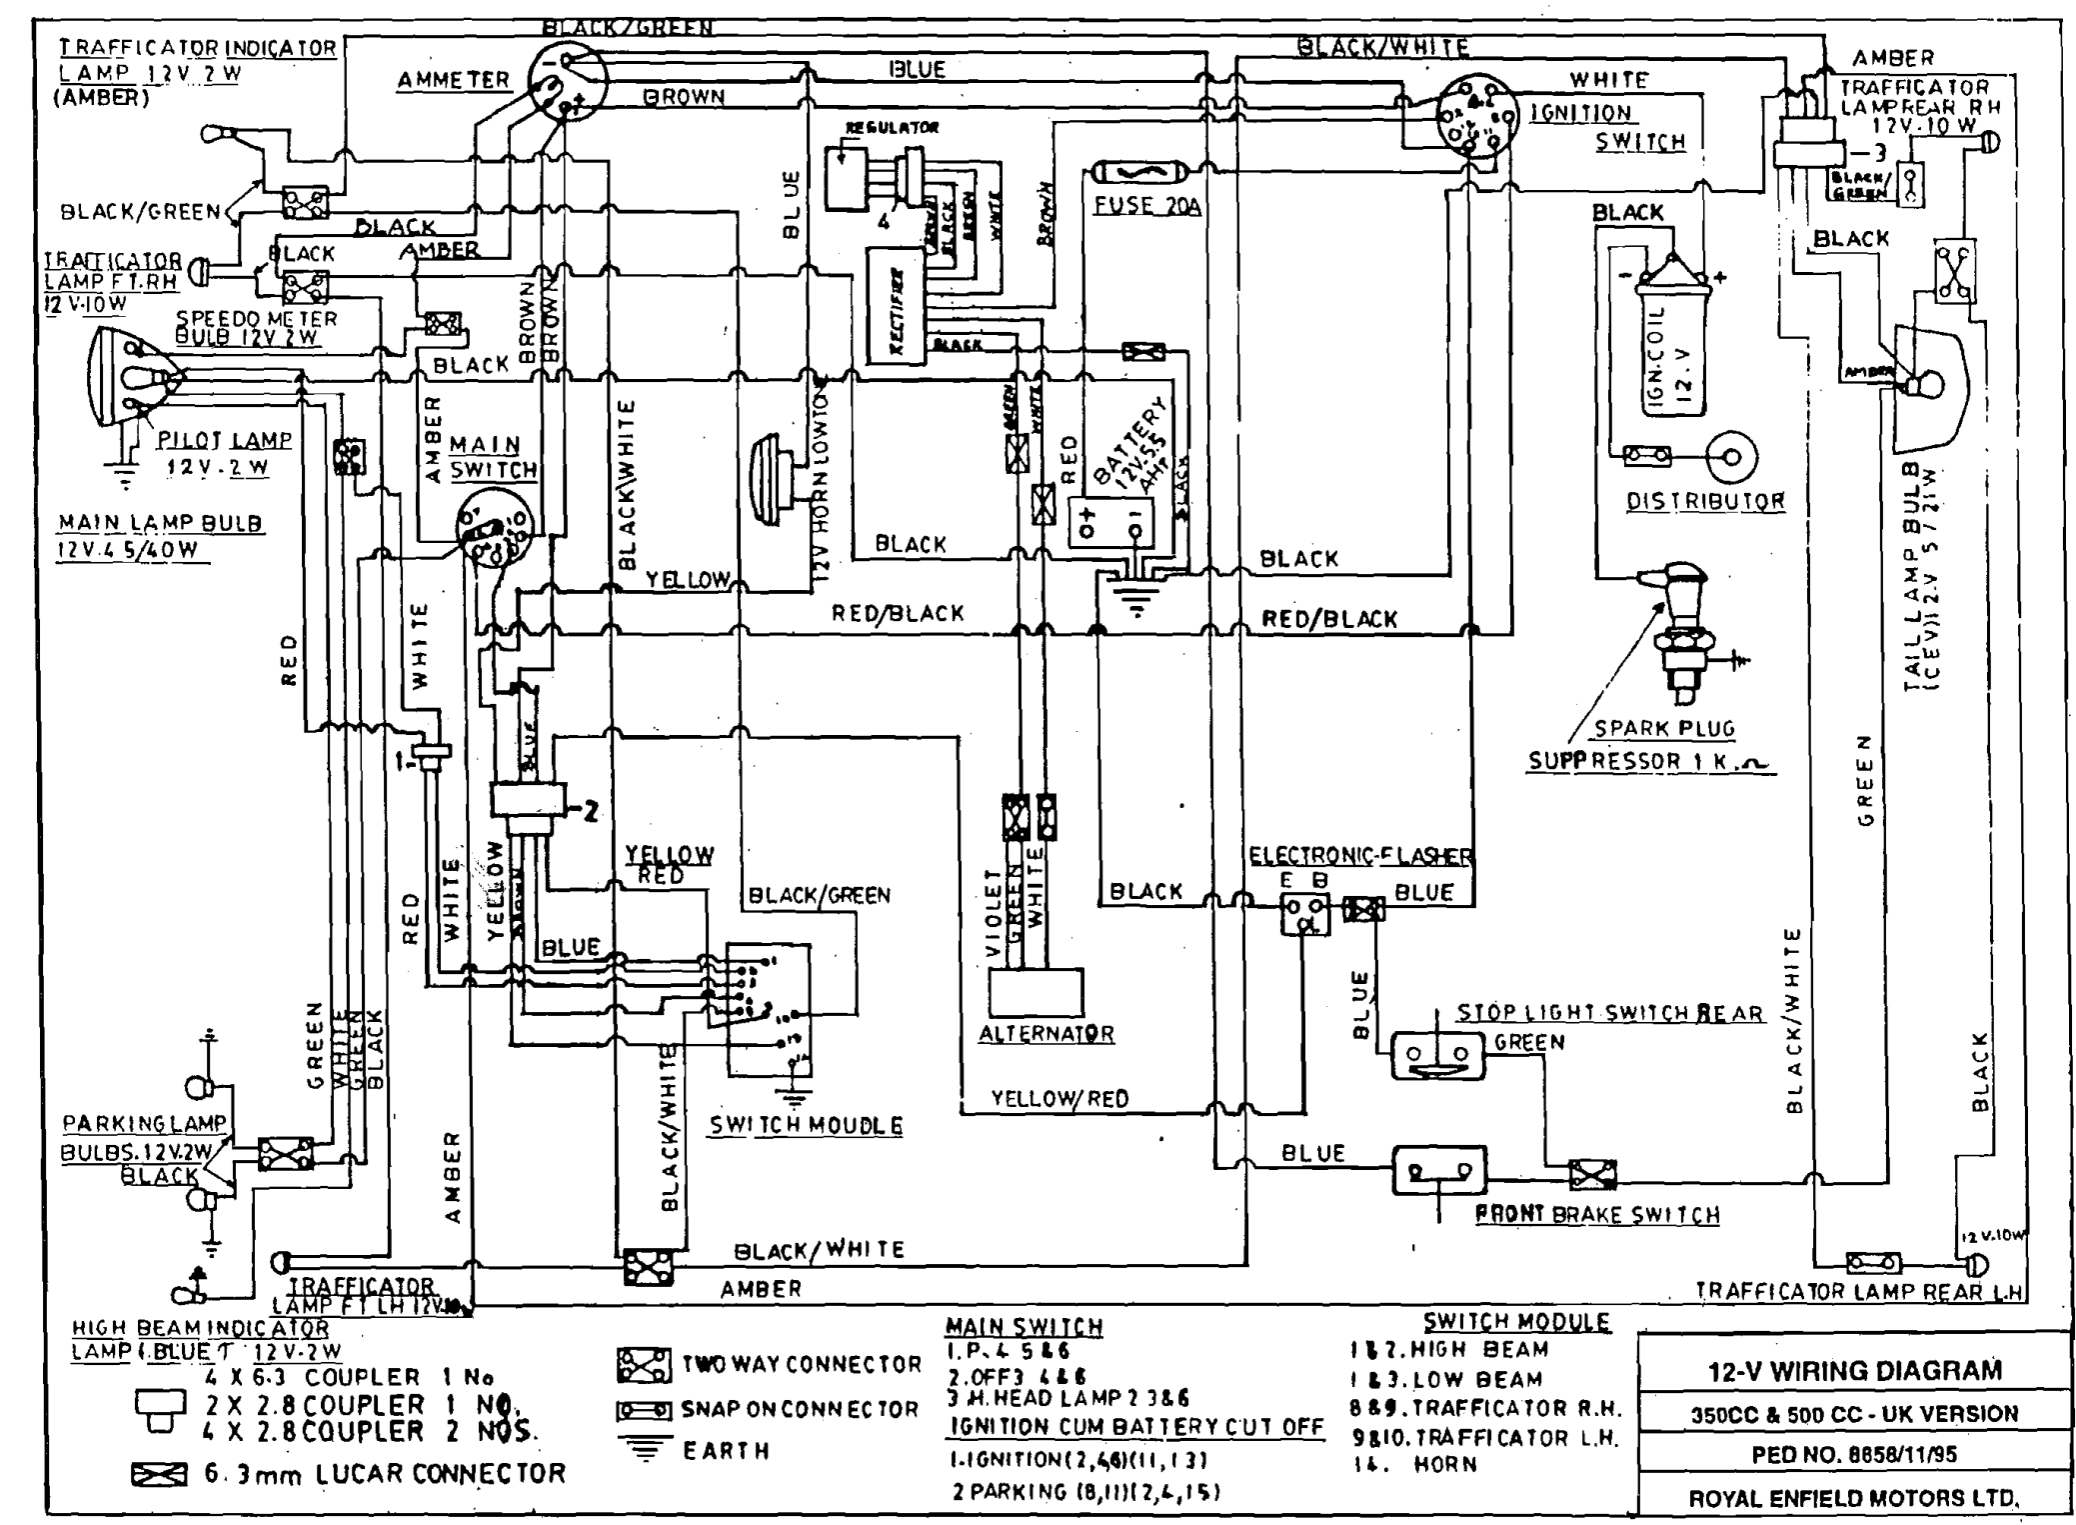 viper 350 hv wiring diagram dsc 1616 02 yamaha 700 tach 39